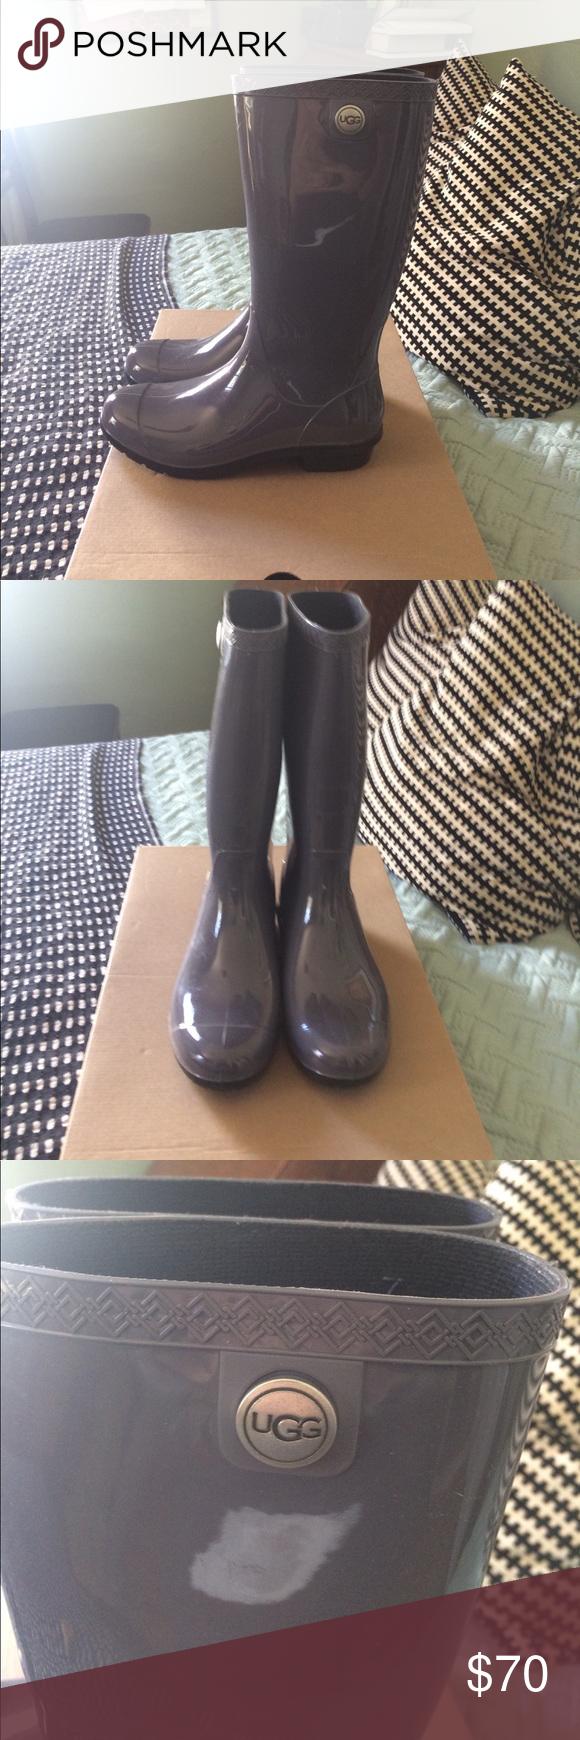 73b75fd3f1a UGG. Rain boots NEW UGG. Shaye boot. Rain boot. Shearling lined at ...